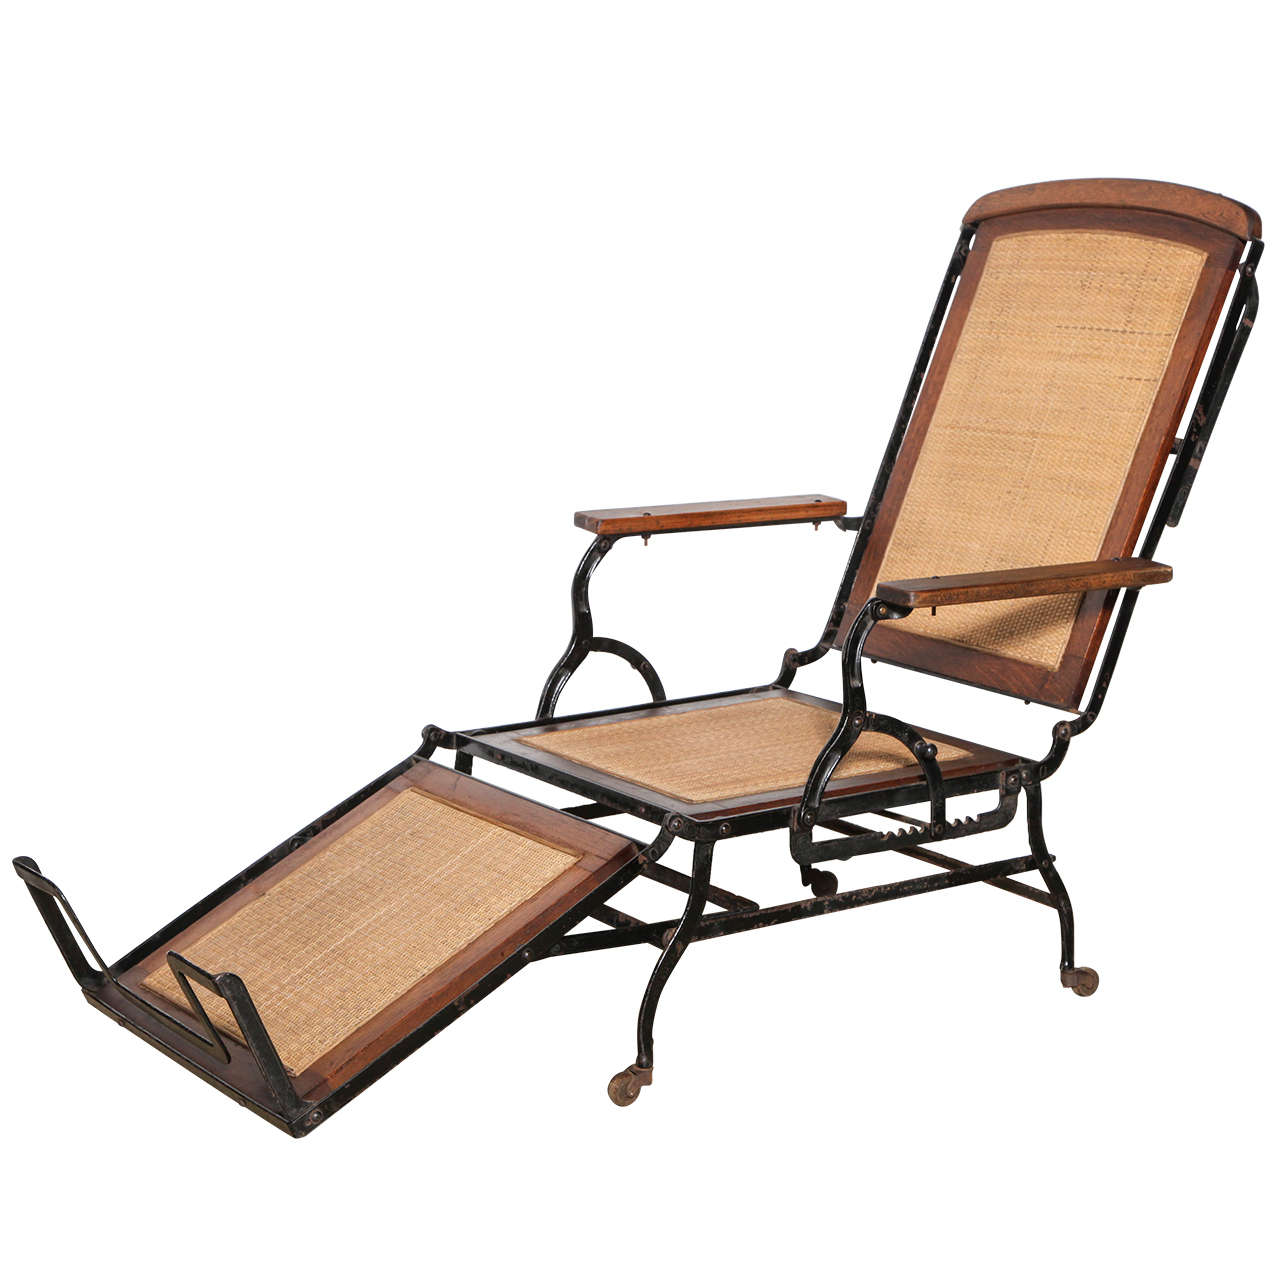 circa 1876 folding Chaise Lounge Chair at 1stdibs